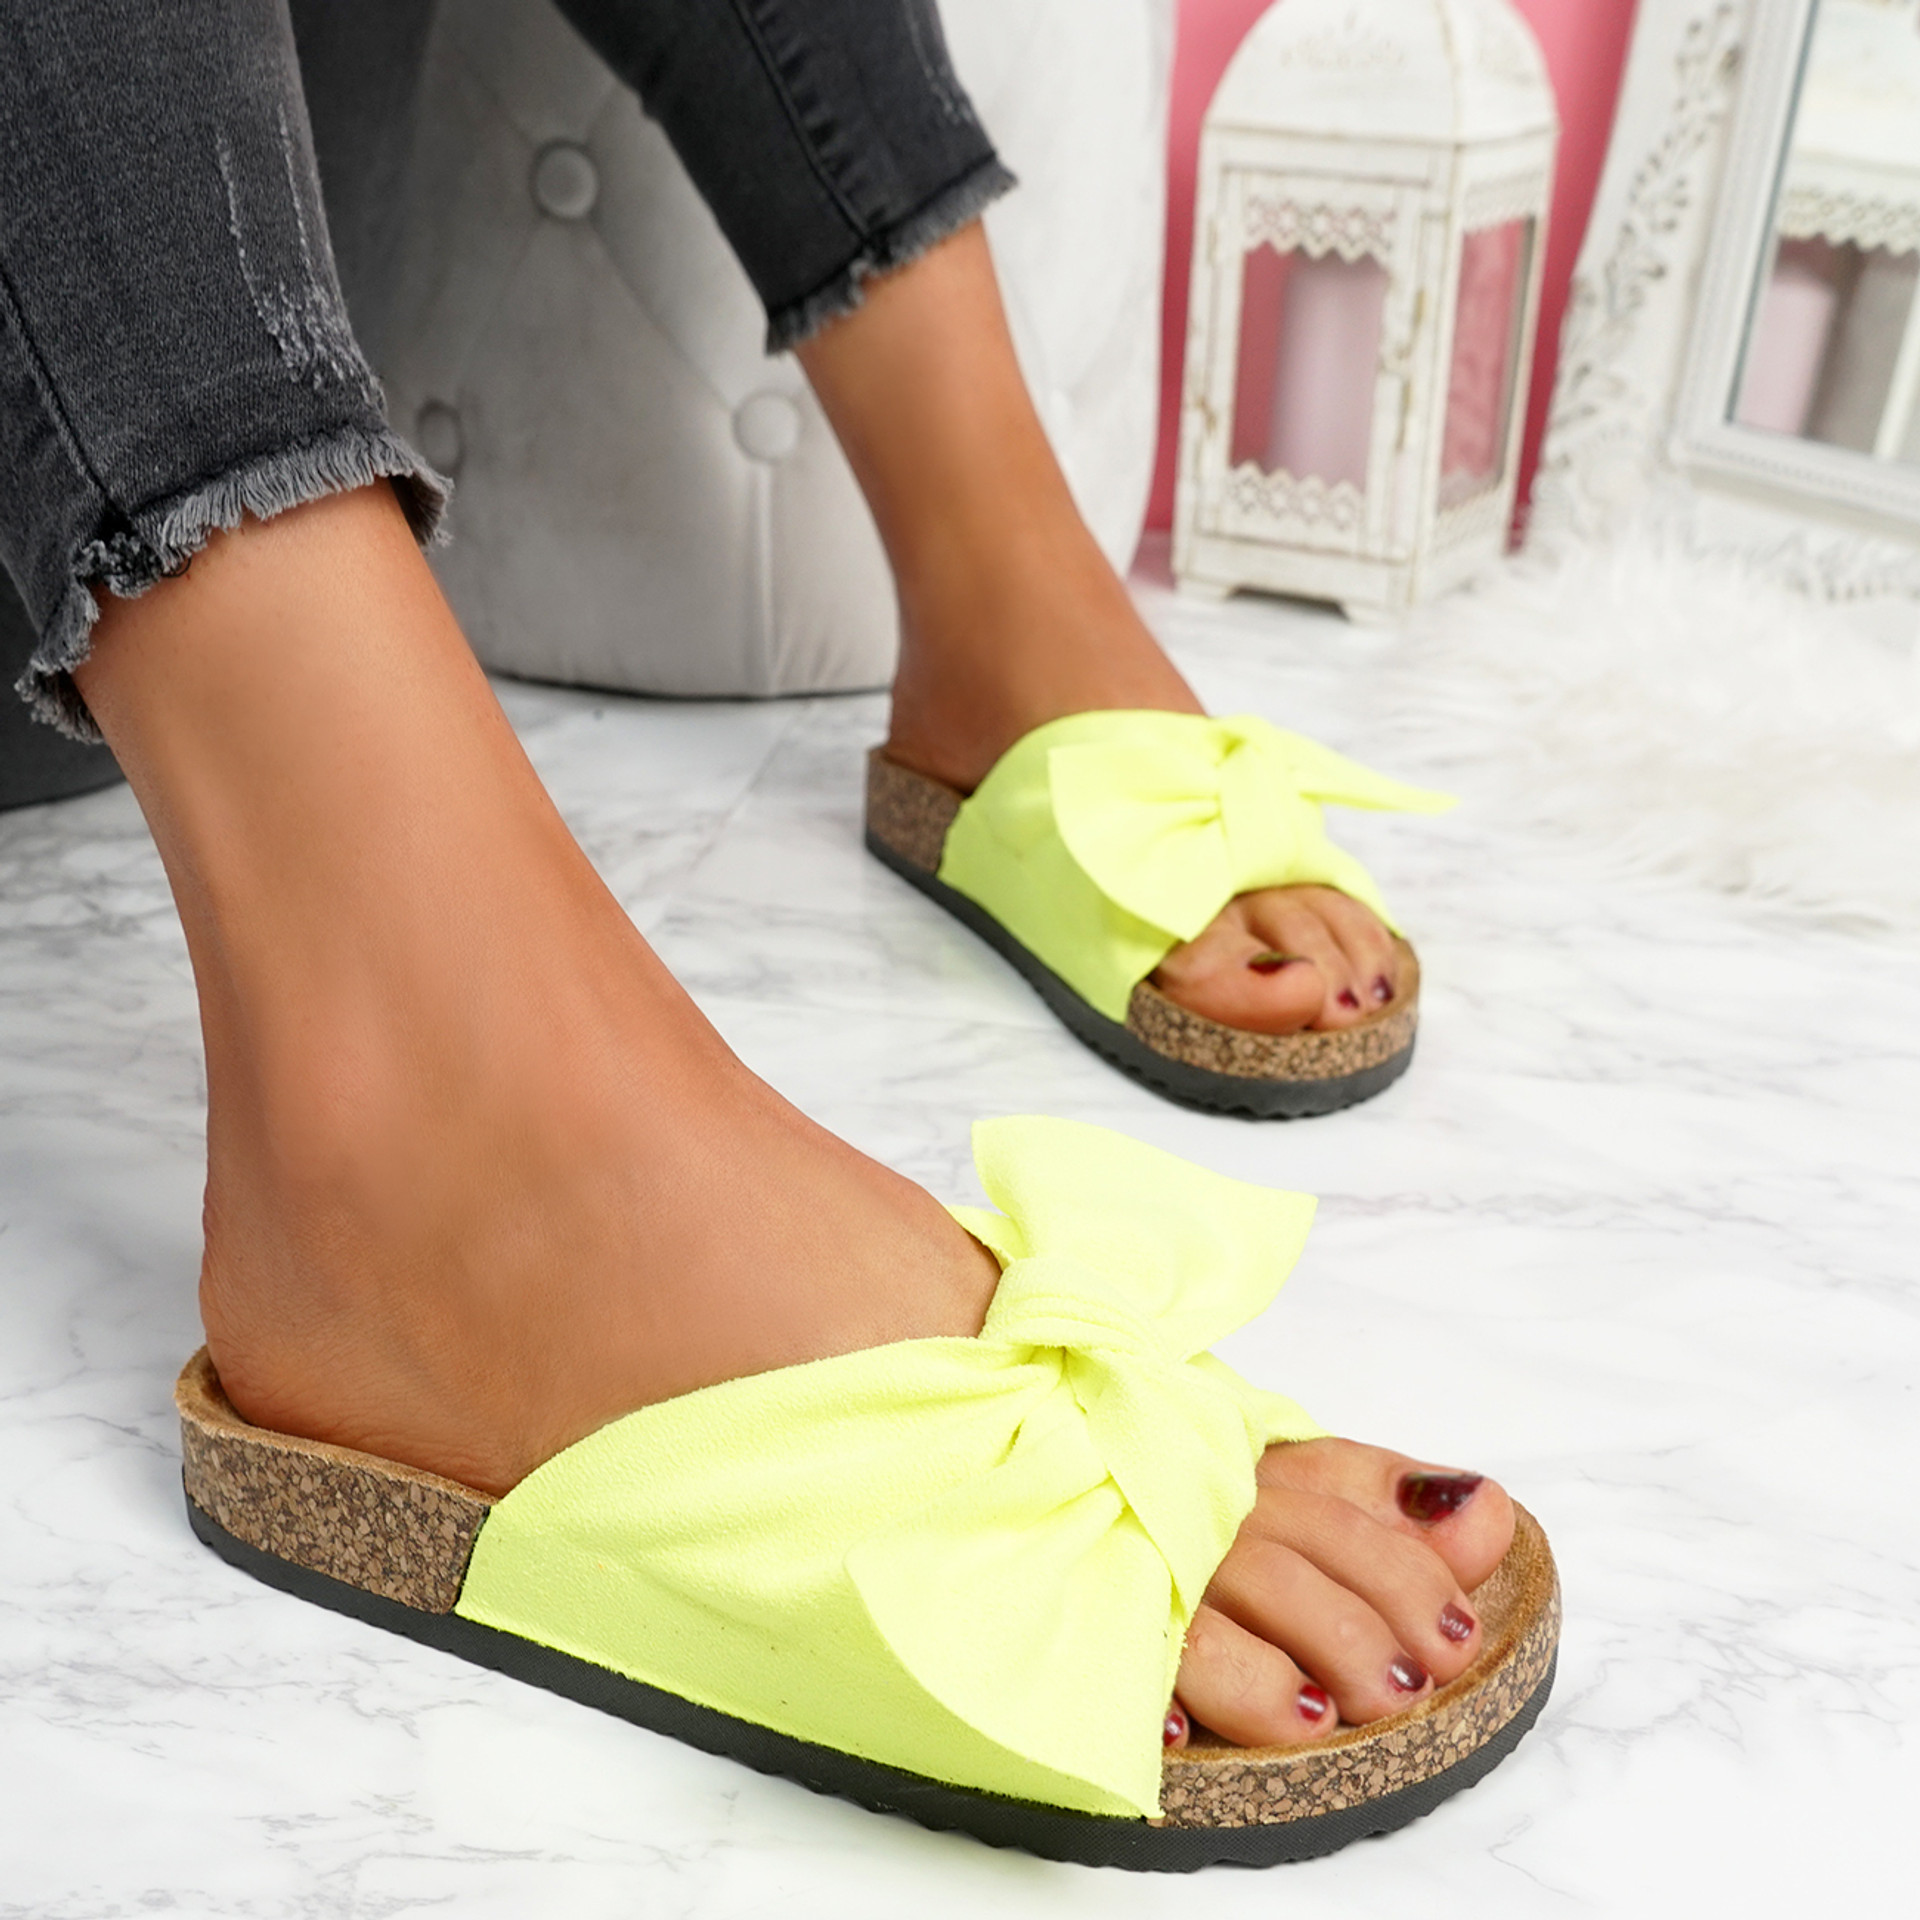 Lela Fluorescent Green Bow Flat Sandals